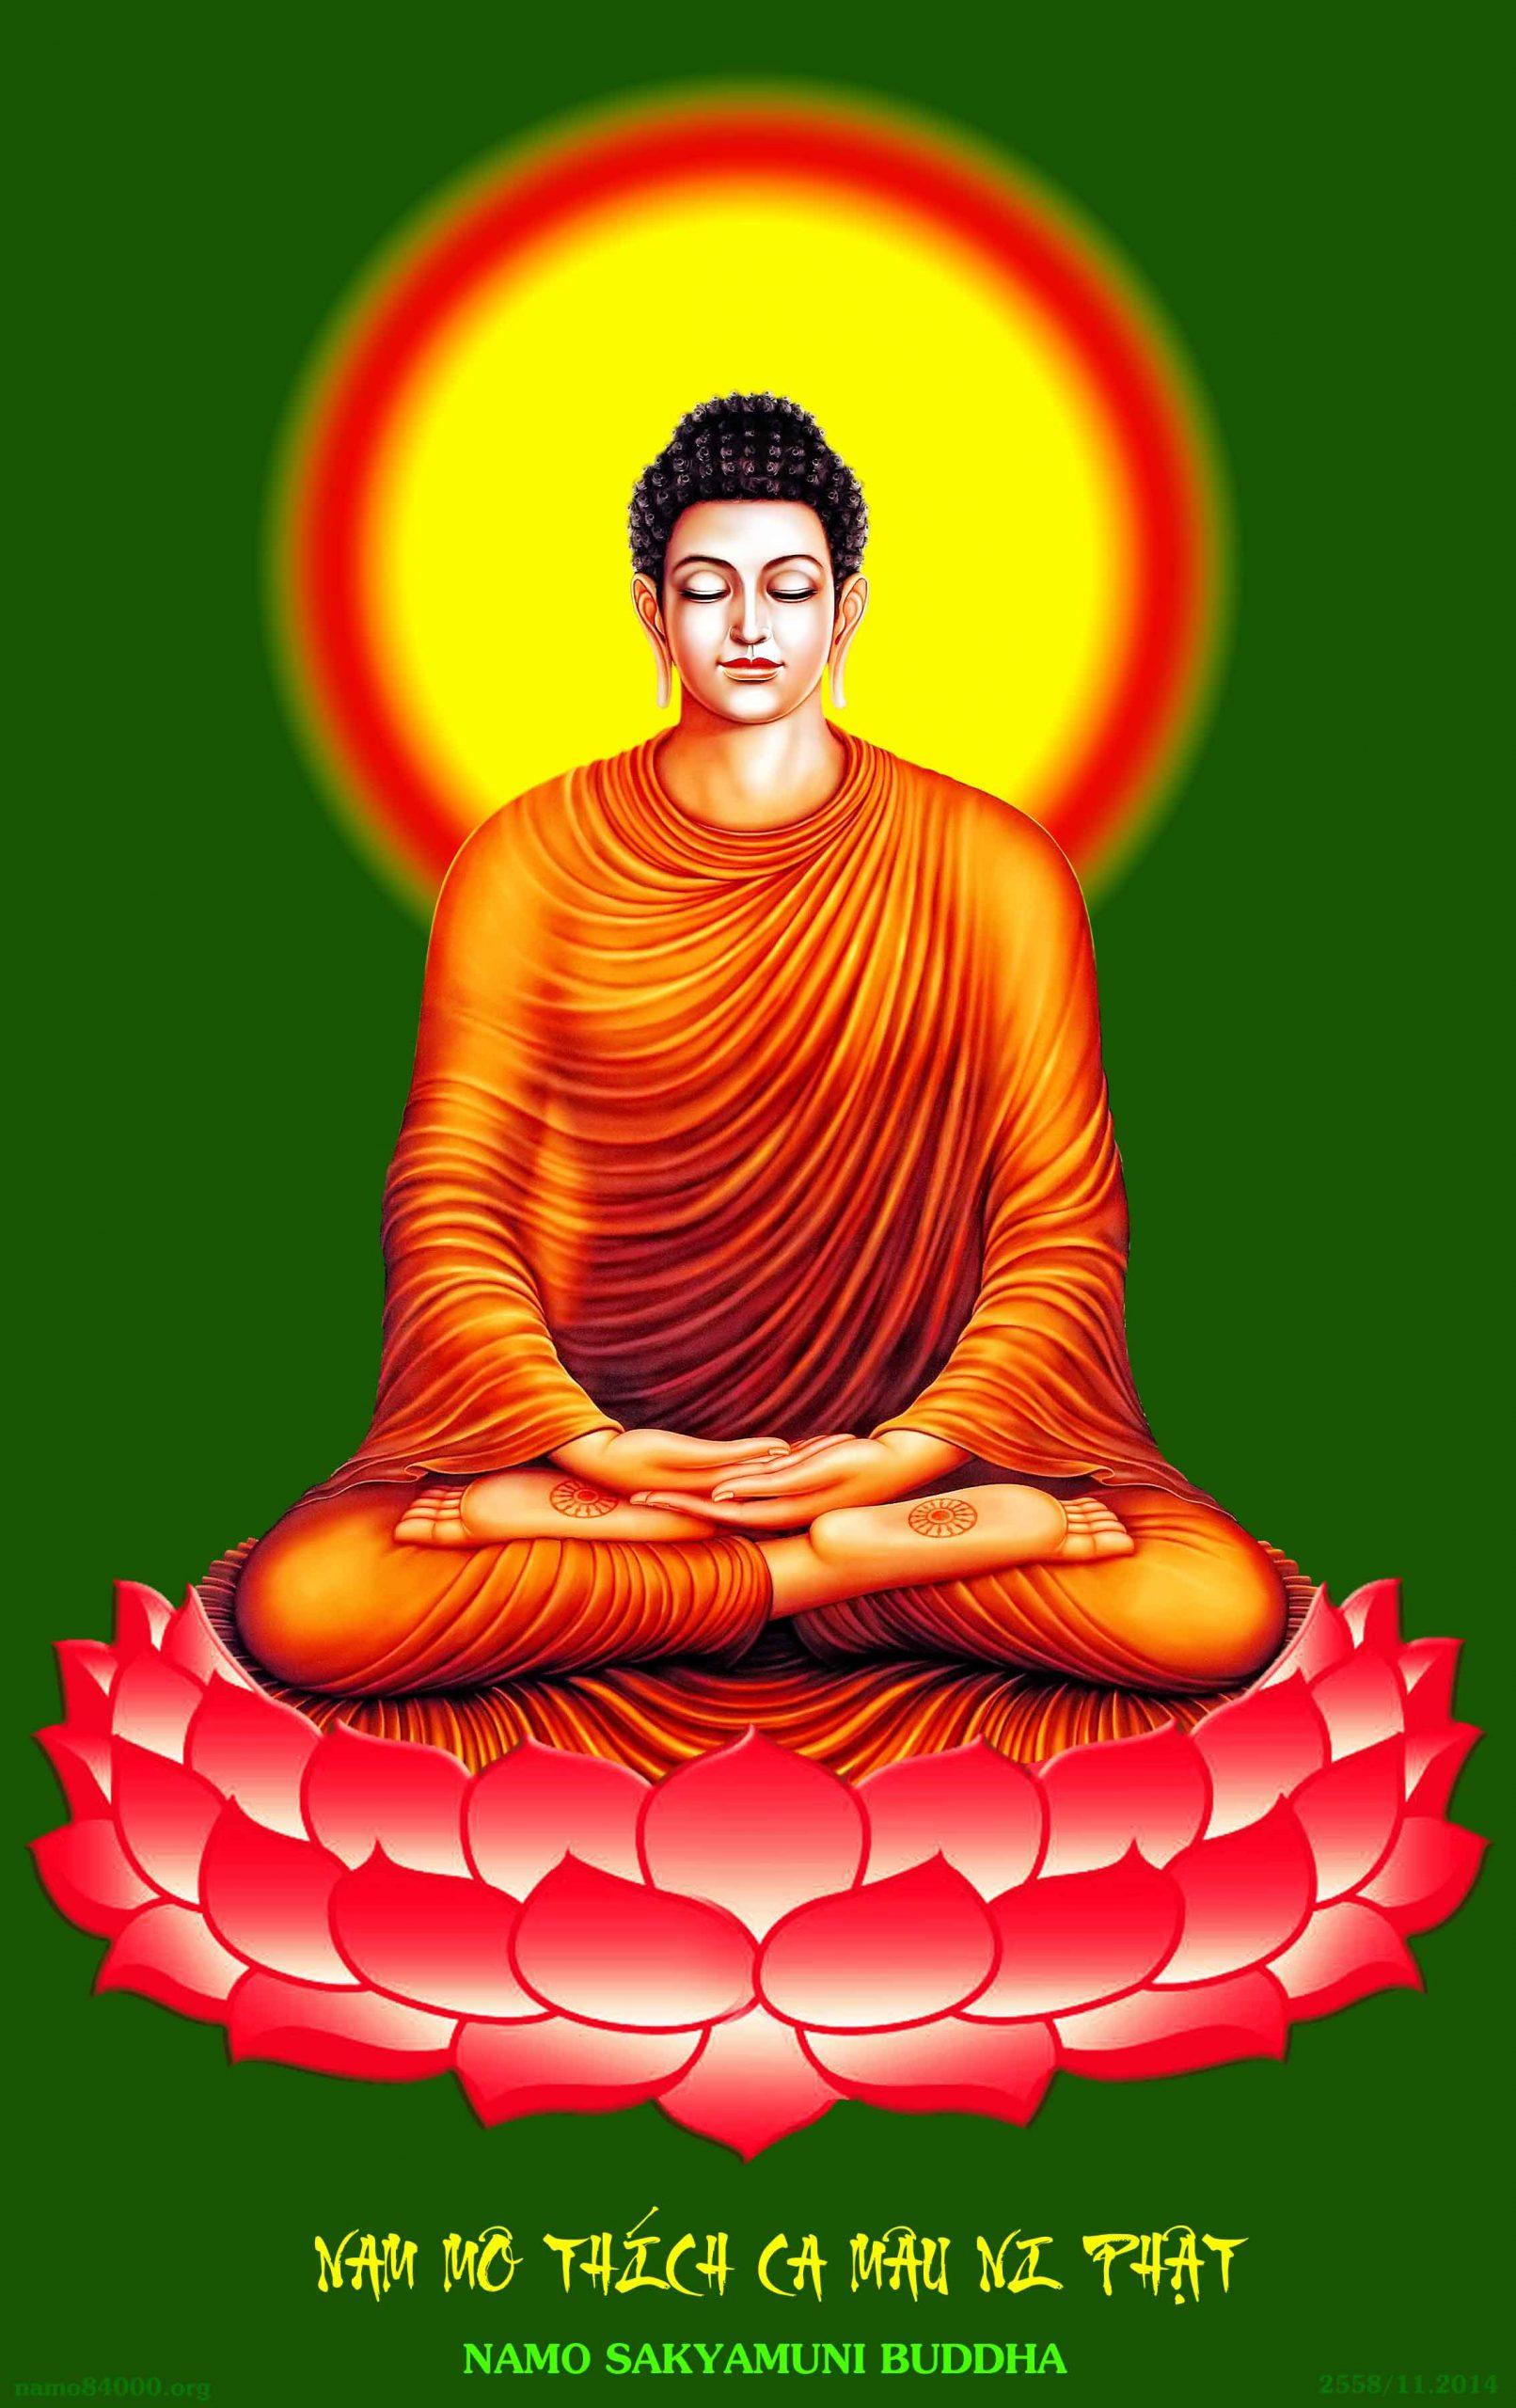 Phật Thích Ca Mâu Ni Shakyamuni Buddha Gautama 本師釋迦牟尼佛